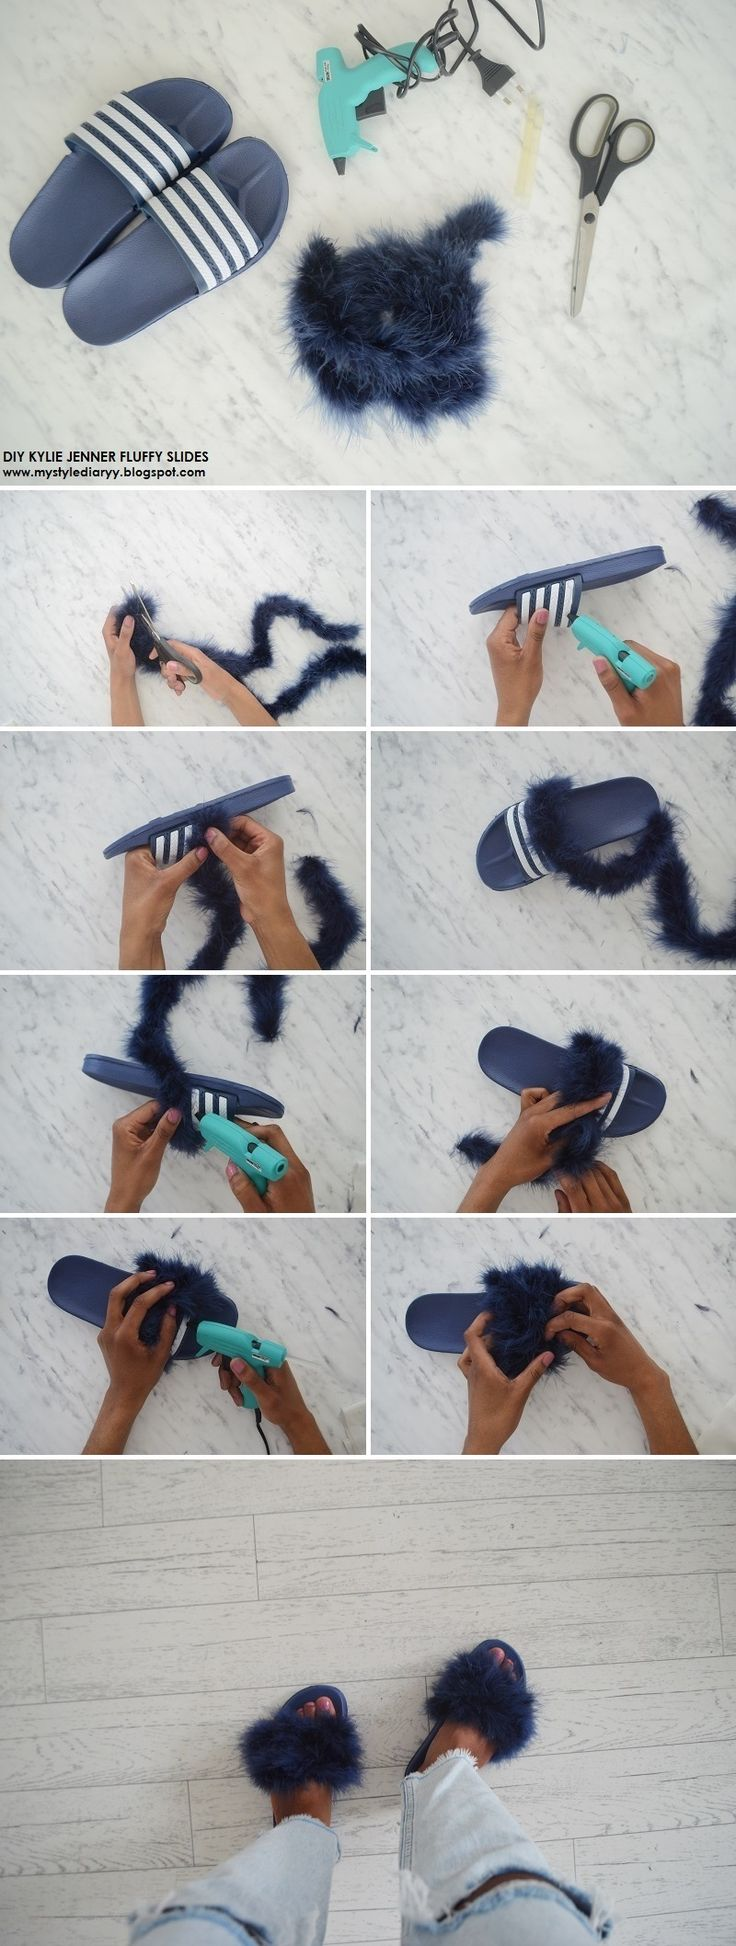 DIY kylie jenner fluffy slides (mothers day gift)